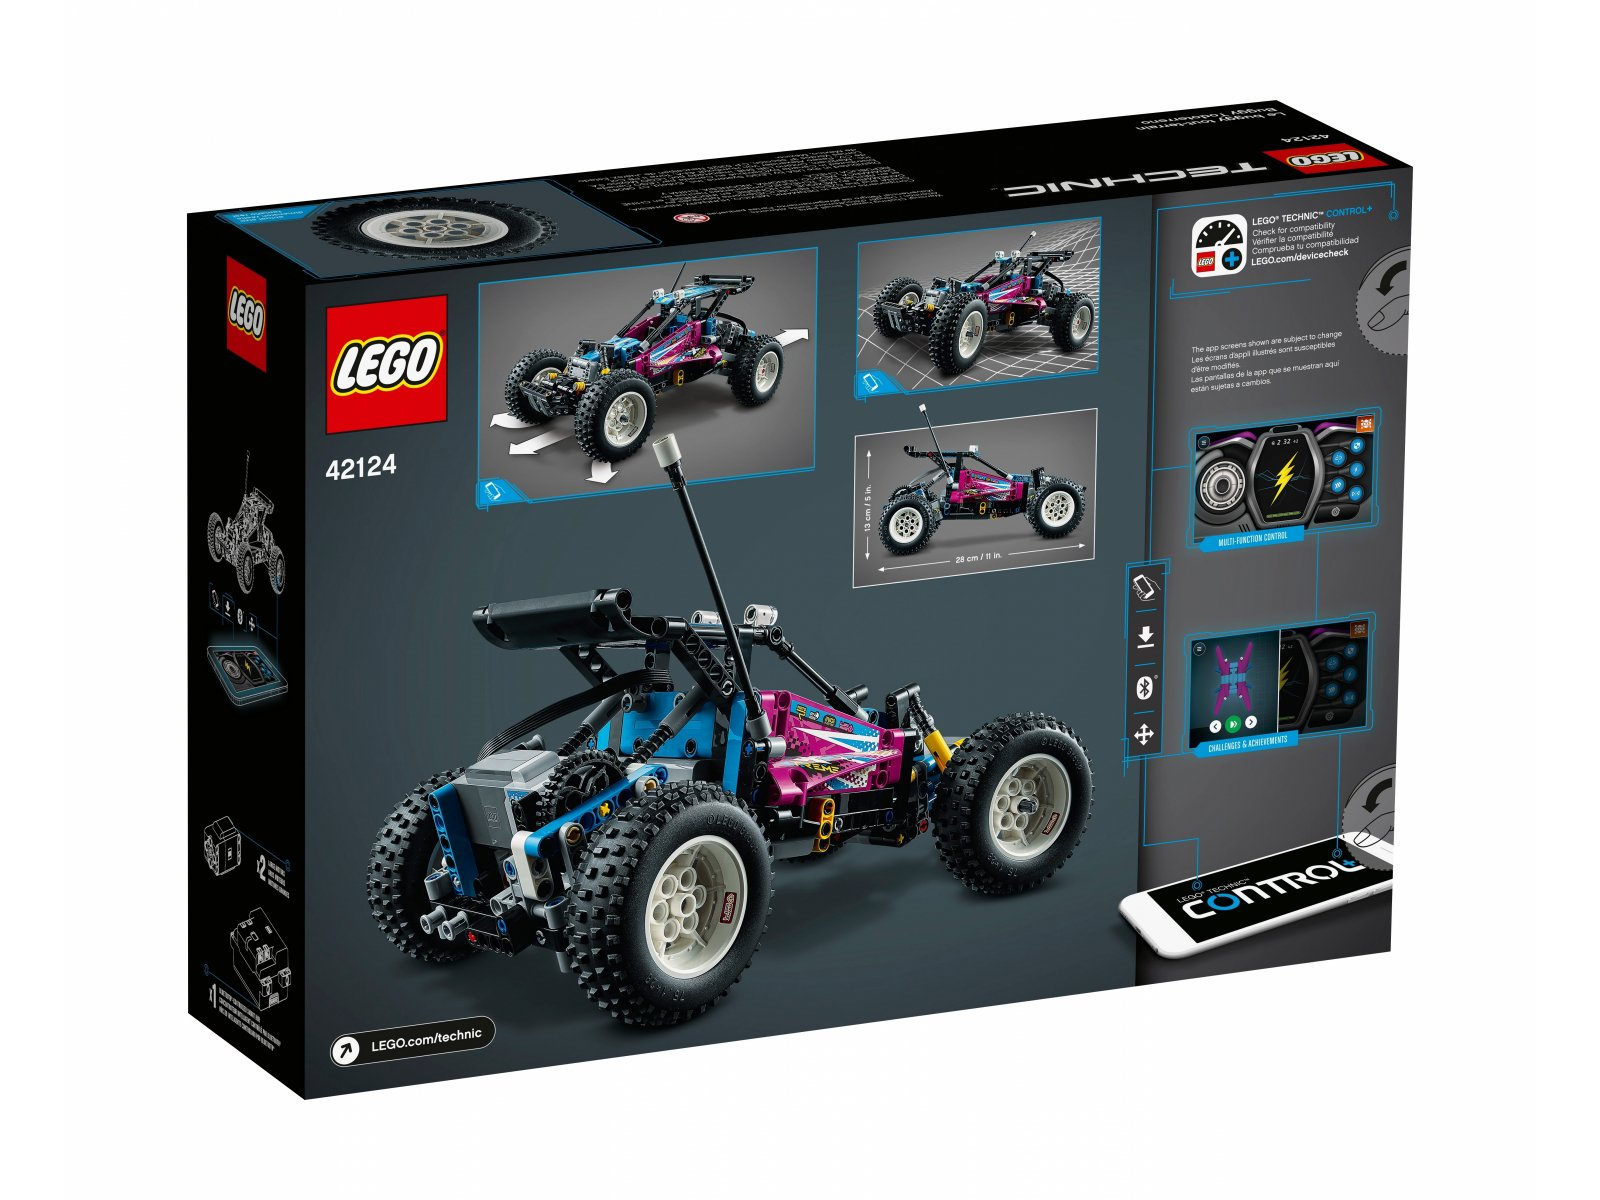 LEGO 42124 Technic Łazik terenowy